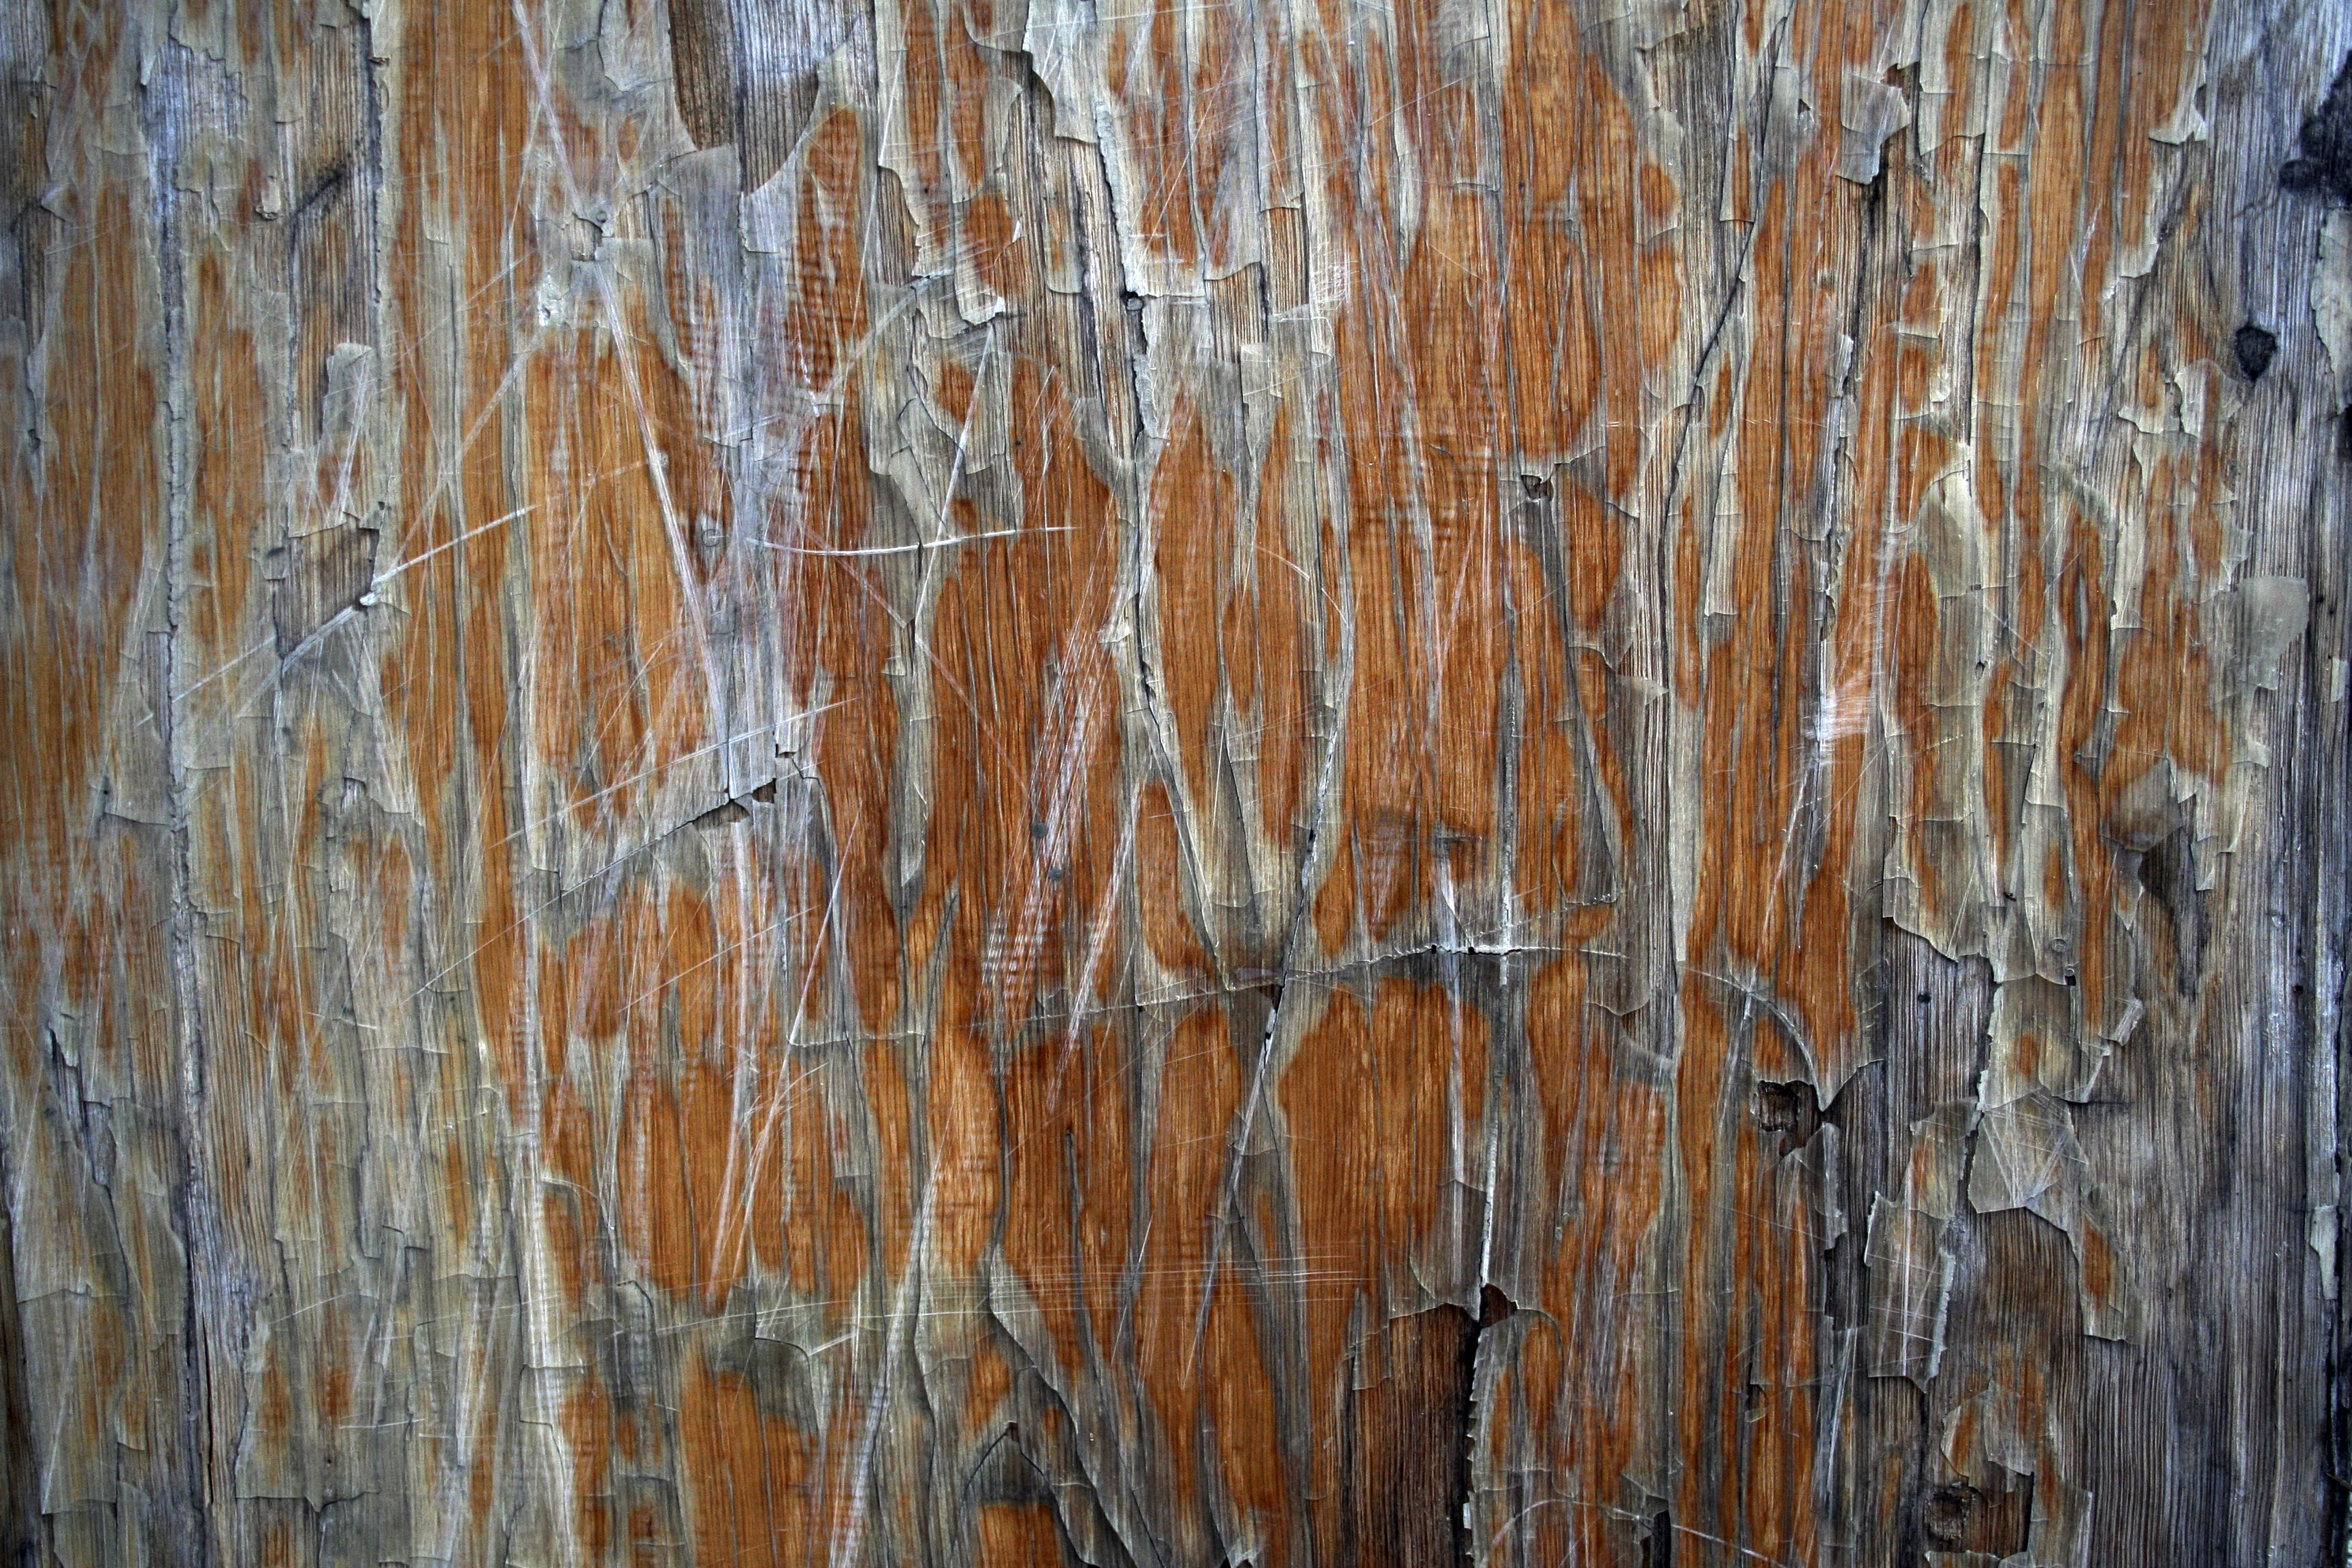 Grunge wood texture photo